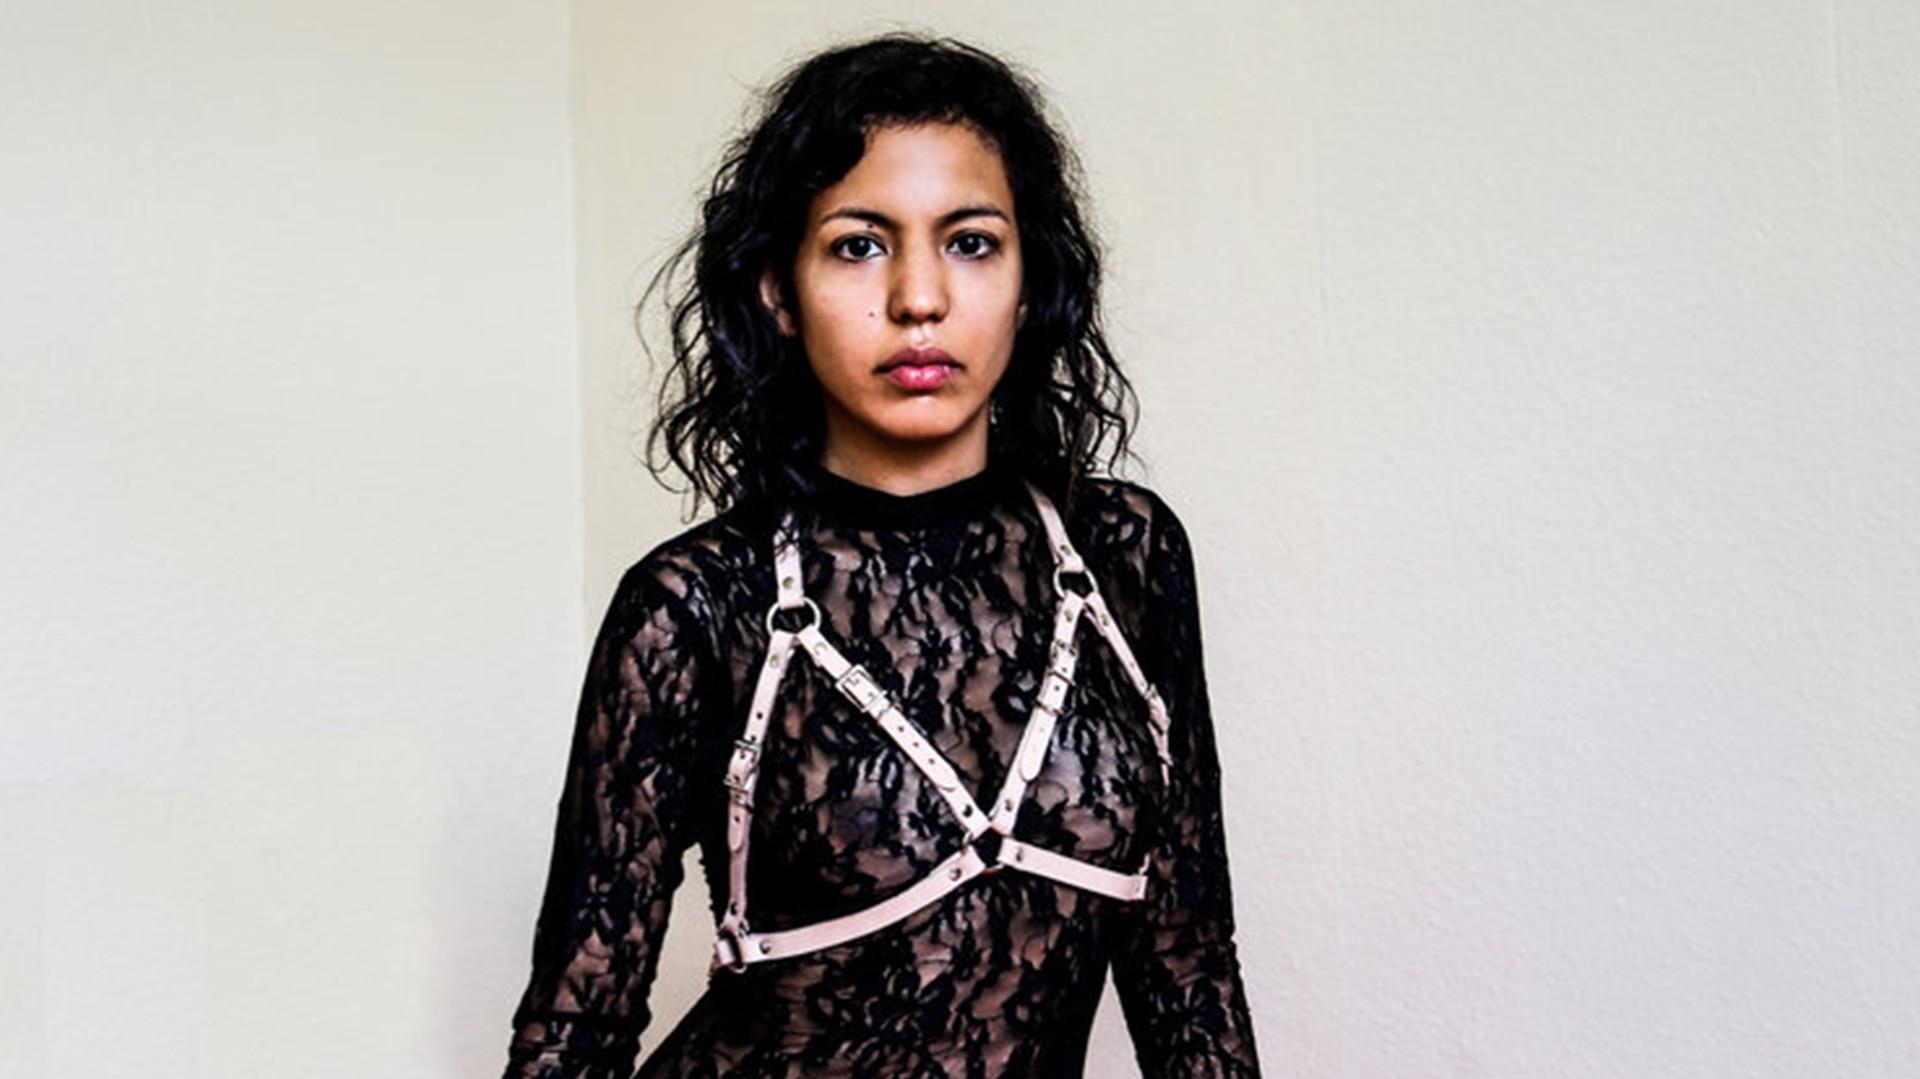 Pelicula Porn Mexicana Clasica video: la mexicana lina bembe, el icono porno feminista que